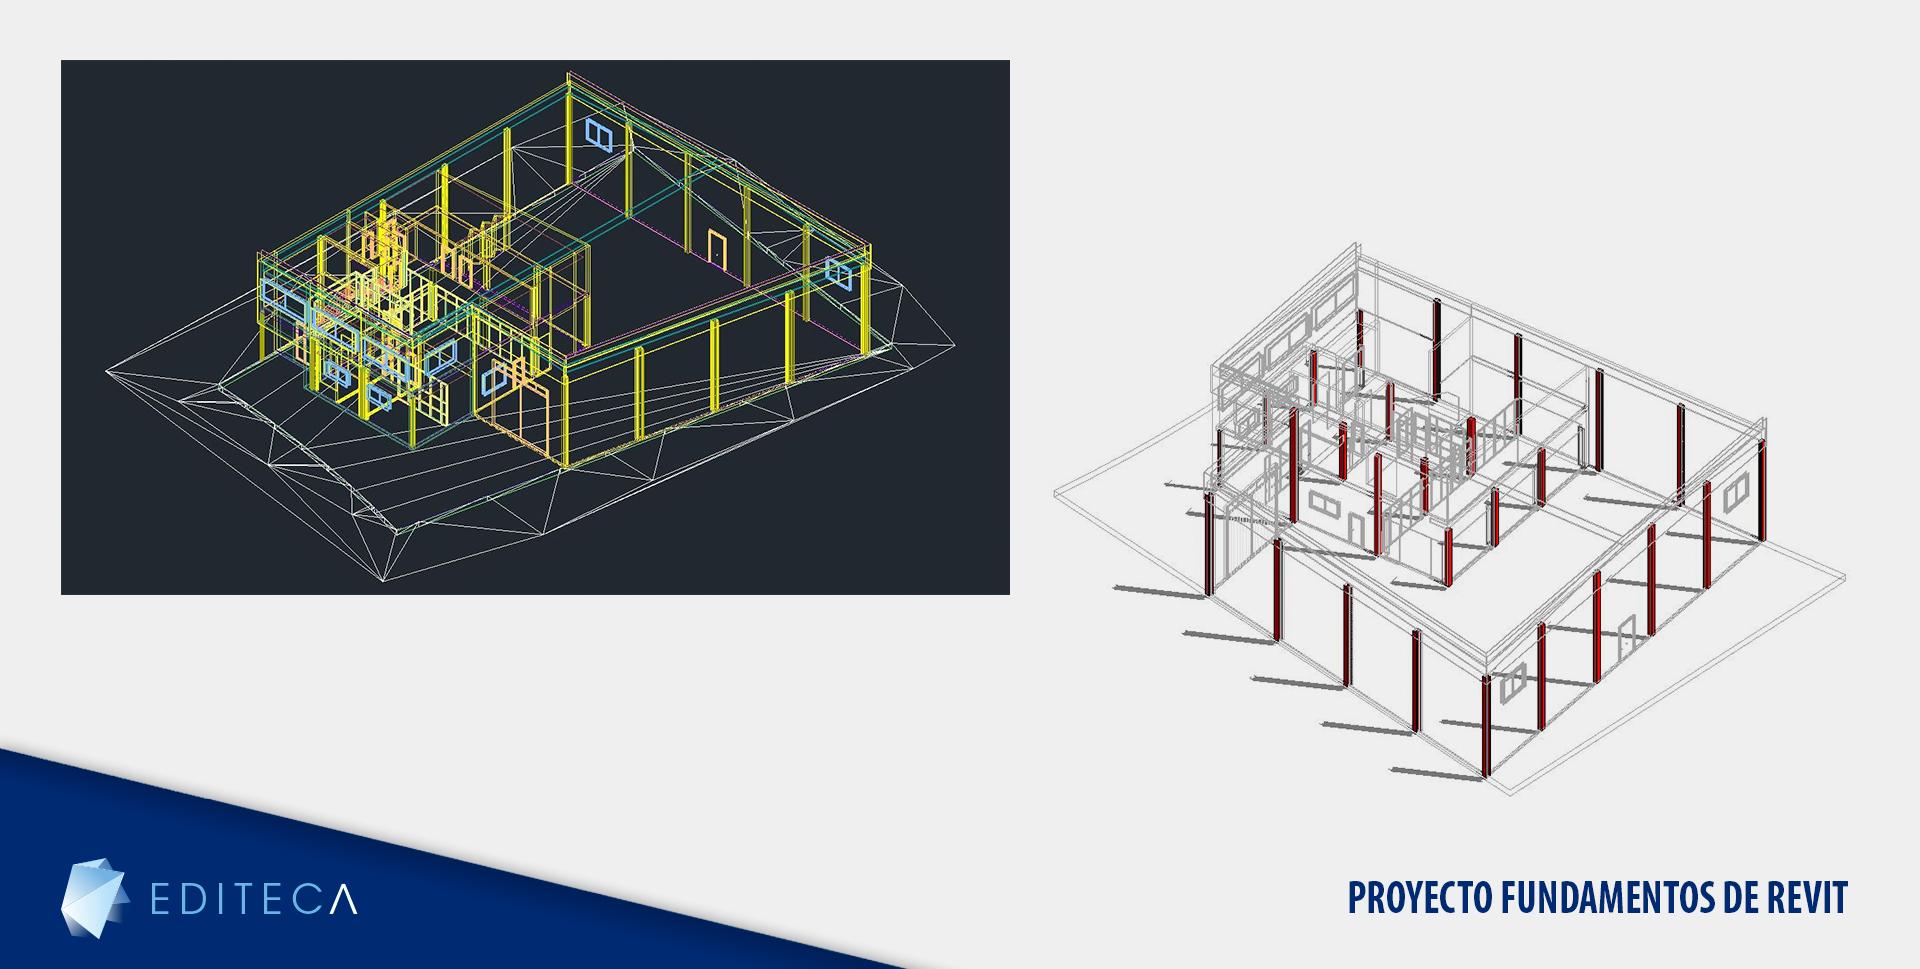 proyectos-imagenes-fundamentosderevit